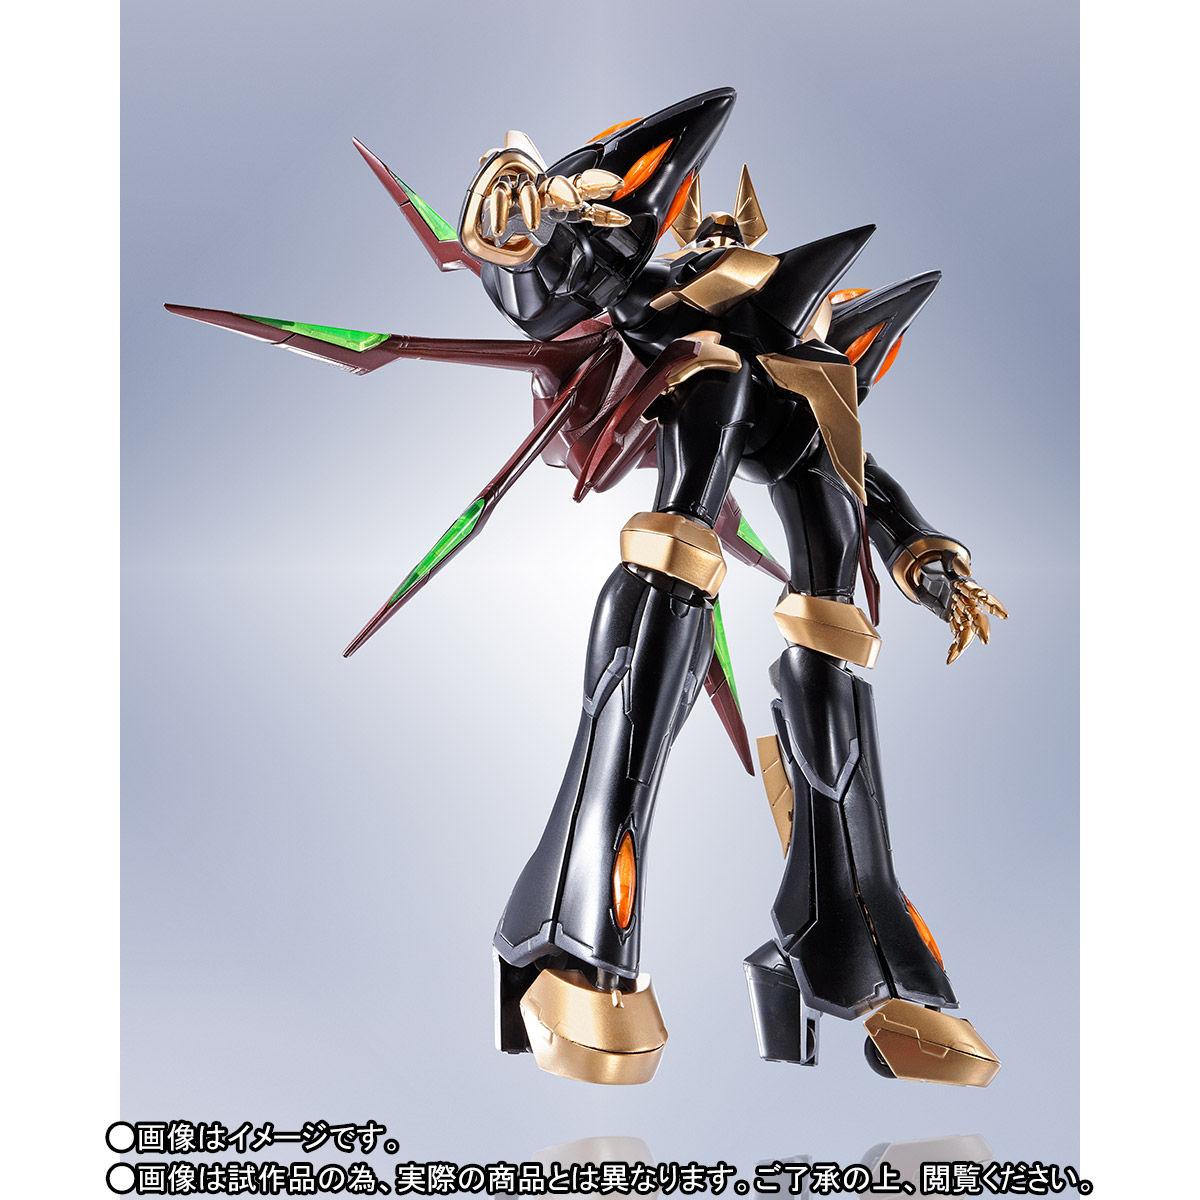 ROBOT魂〈SIDE KMF〉『ガウェイン ~BLACK REBELLION~』コードギアス 可動フィギュア-005